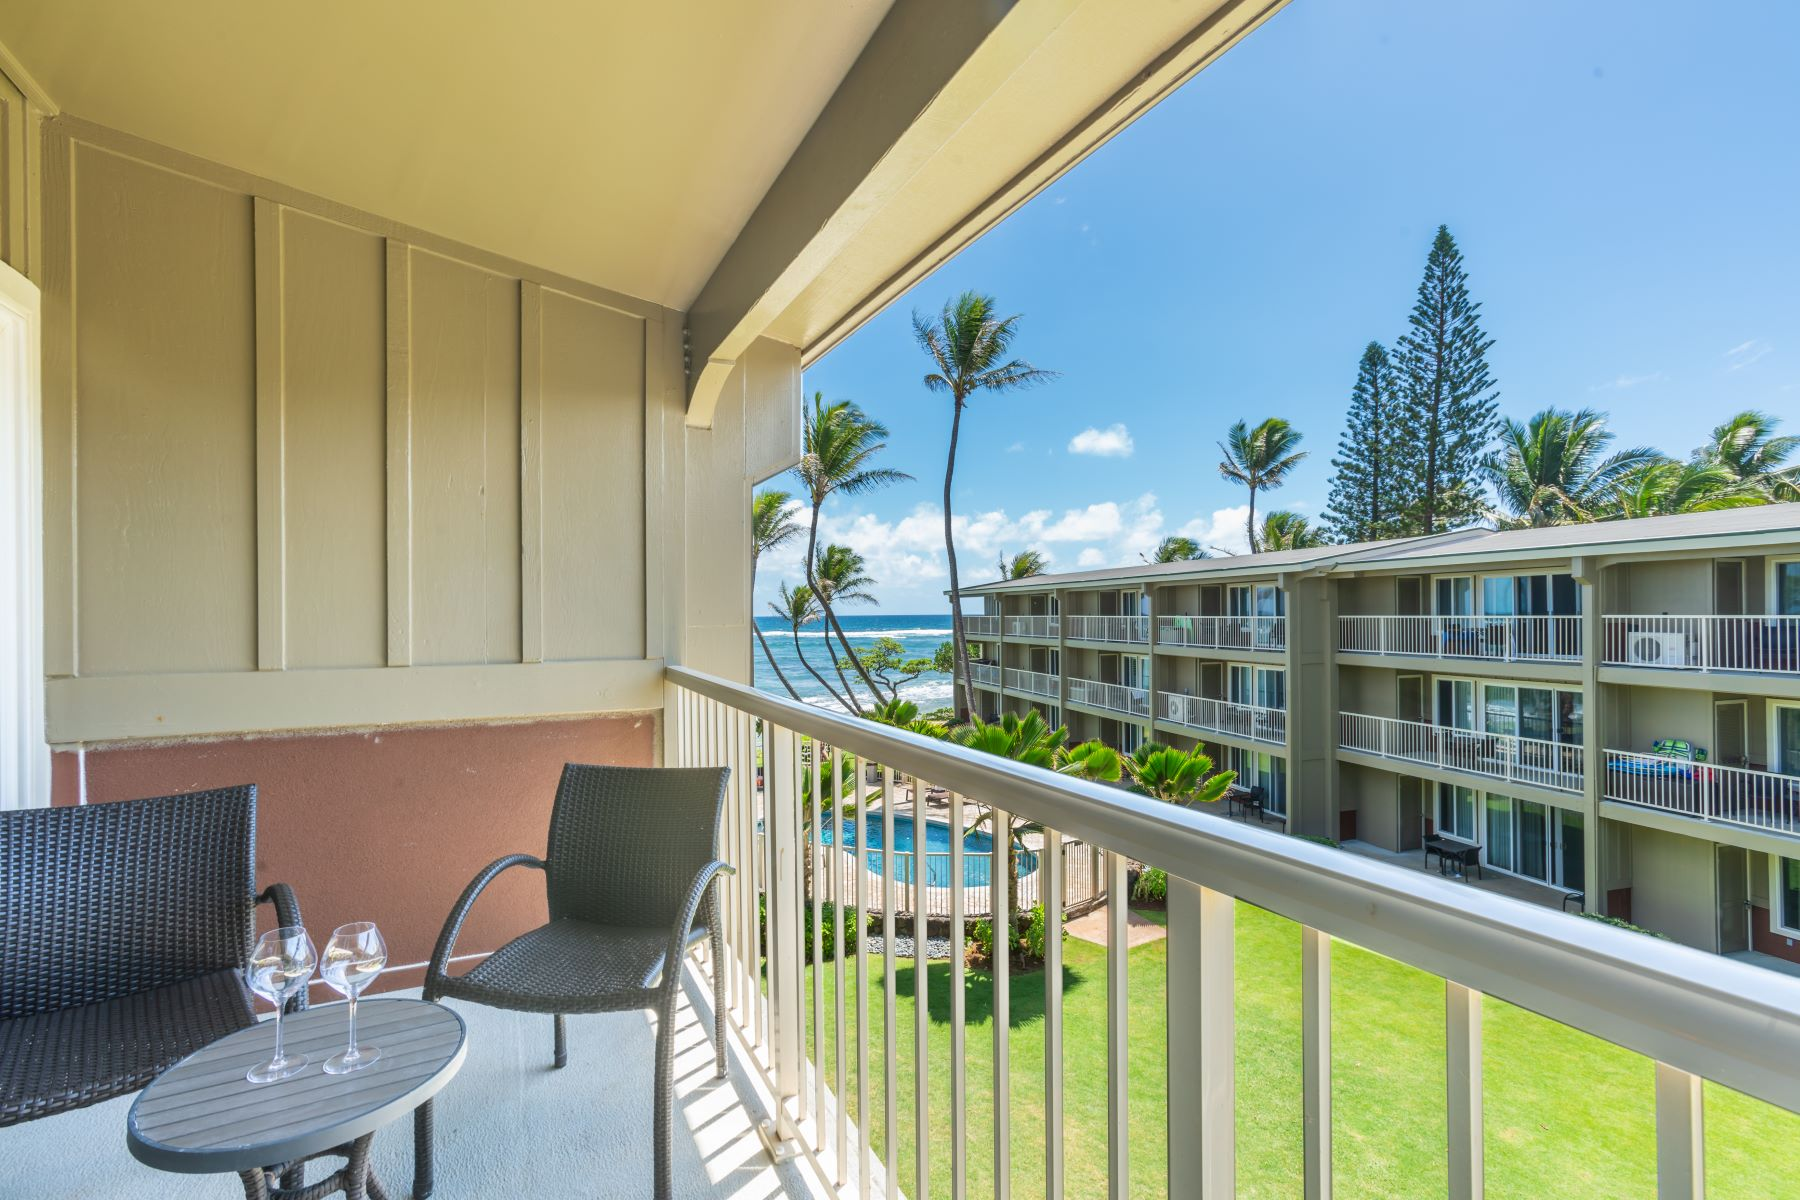 Condominiums 為 出售 在 Kauai Kailani #311 4-856 Kuhio Highway #311, Kapaa, 夏威夷 96756 美國